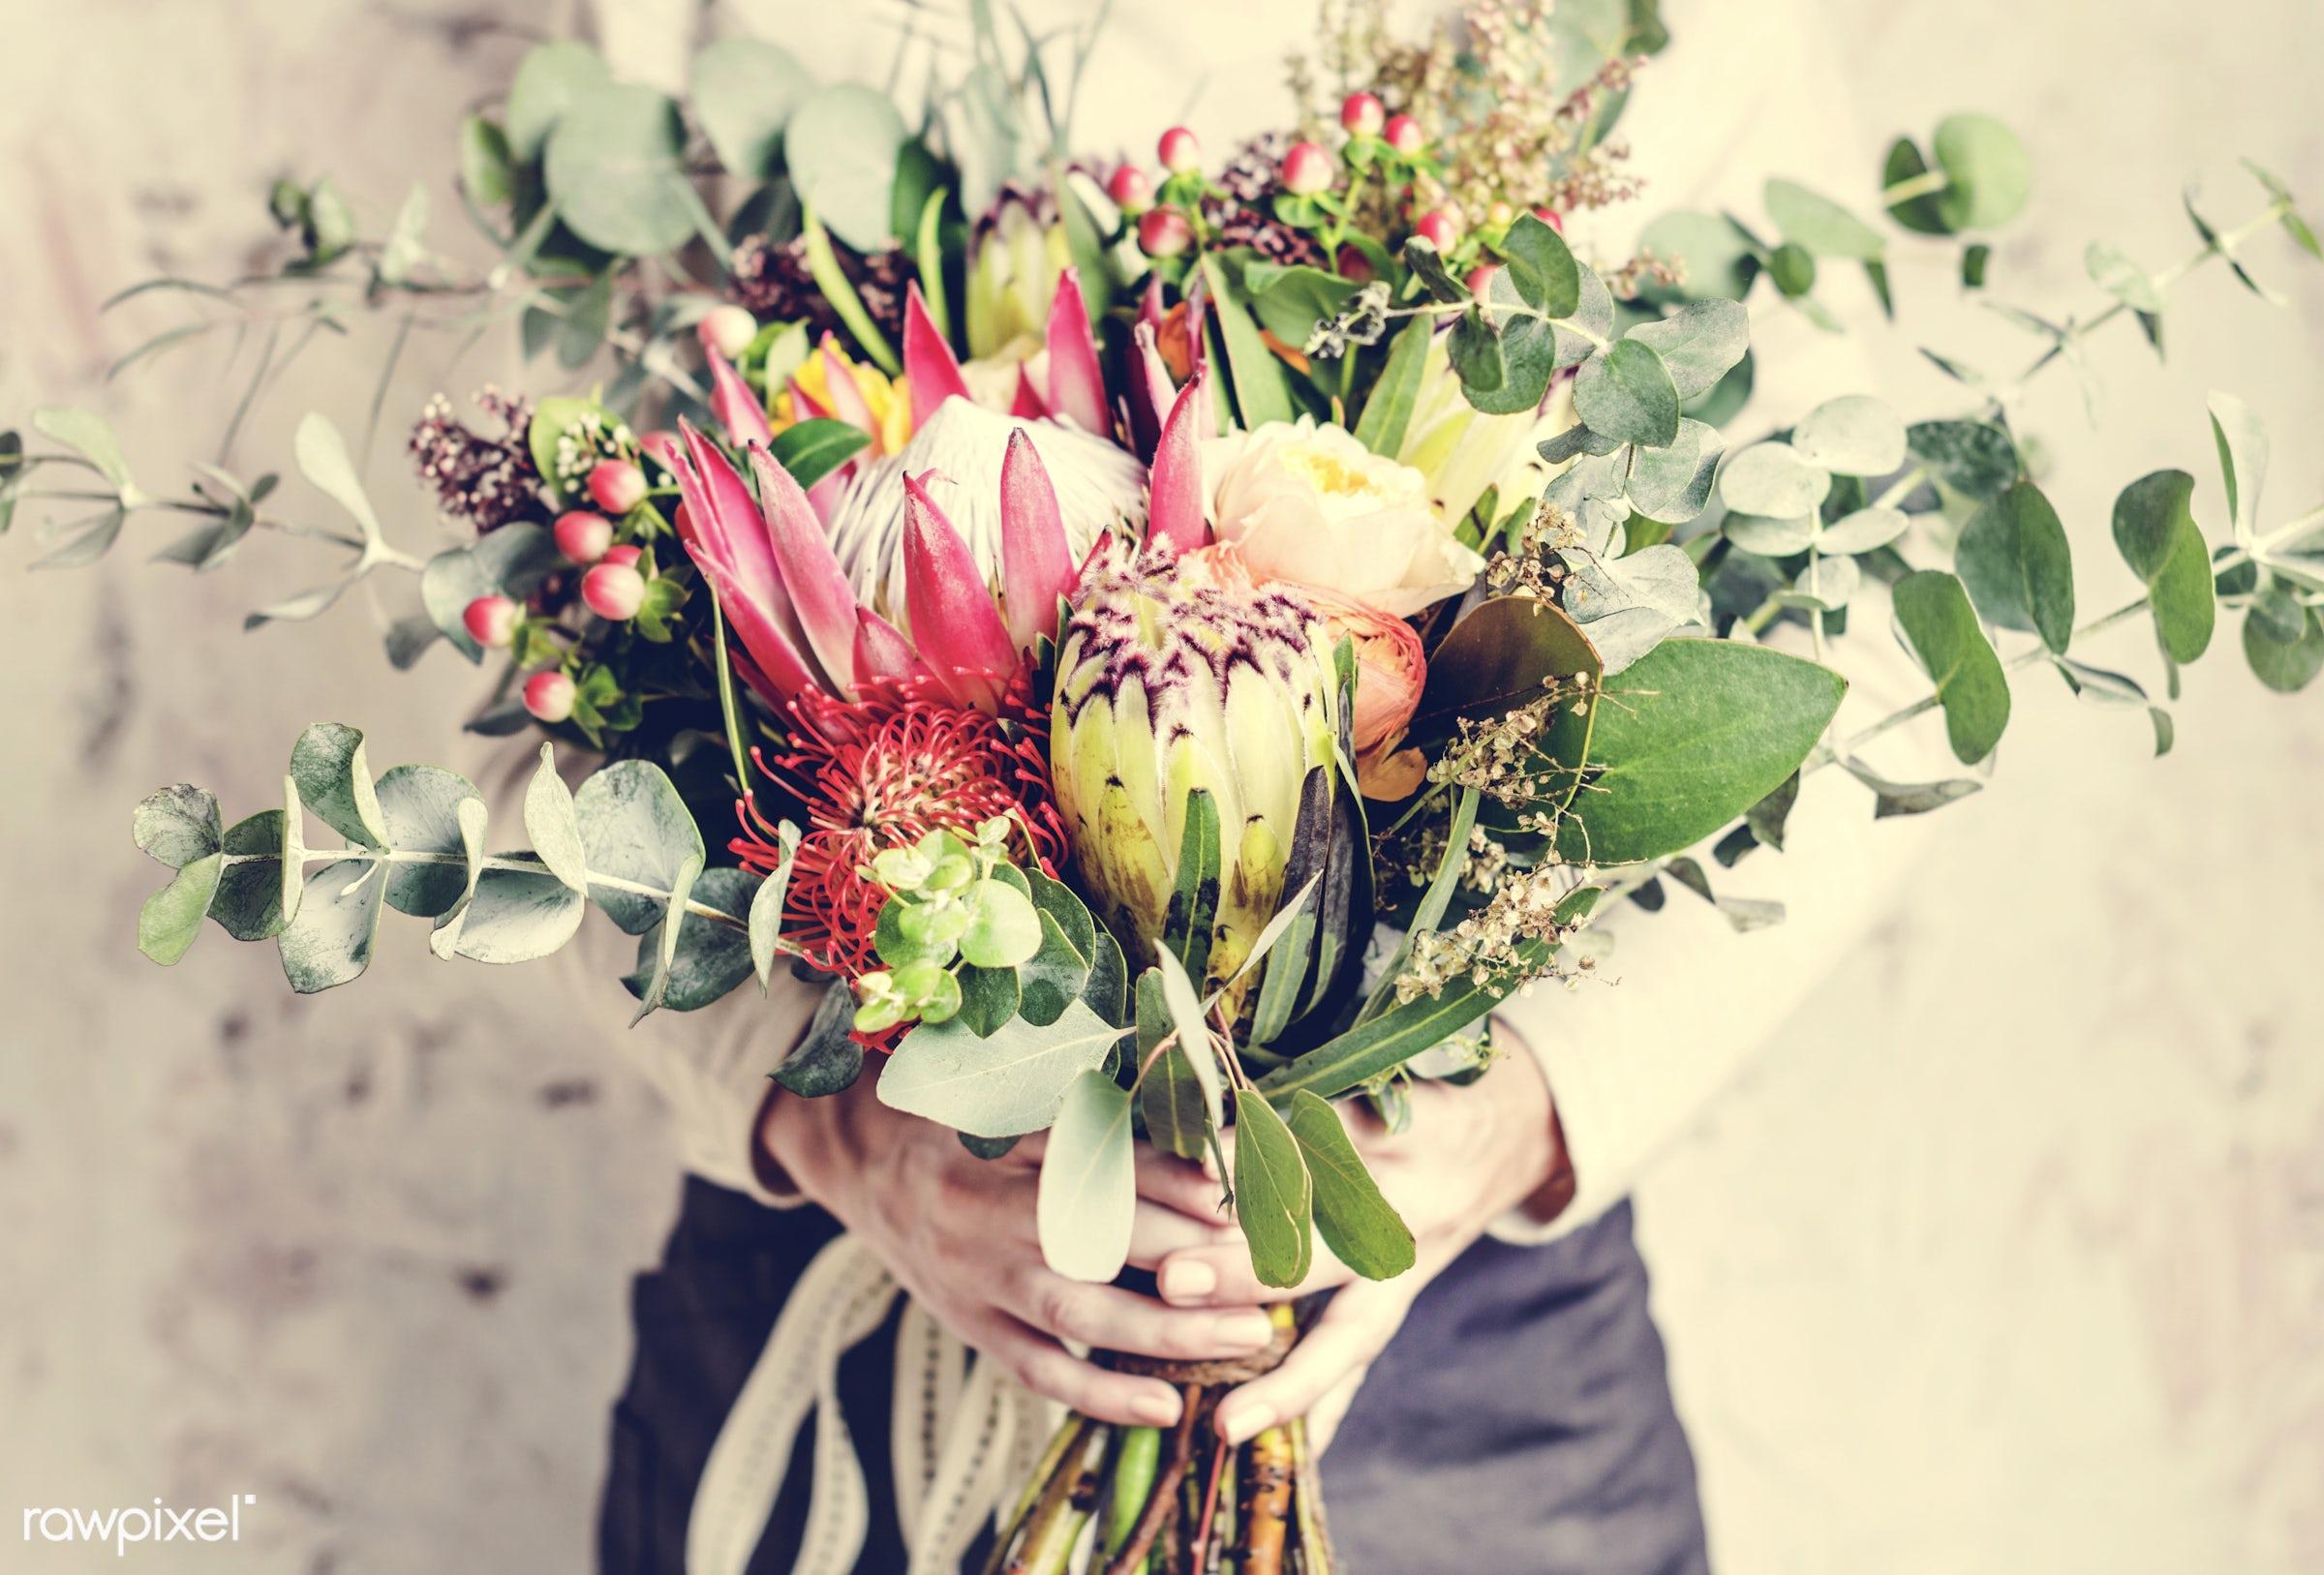 bouquet, detail, person, decorative, diverse, holding, colorful, events, plants, show, spring, people, blossom, love, decor...